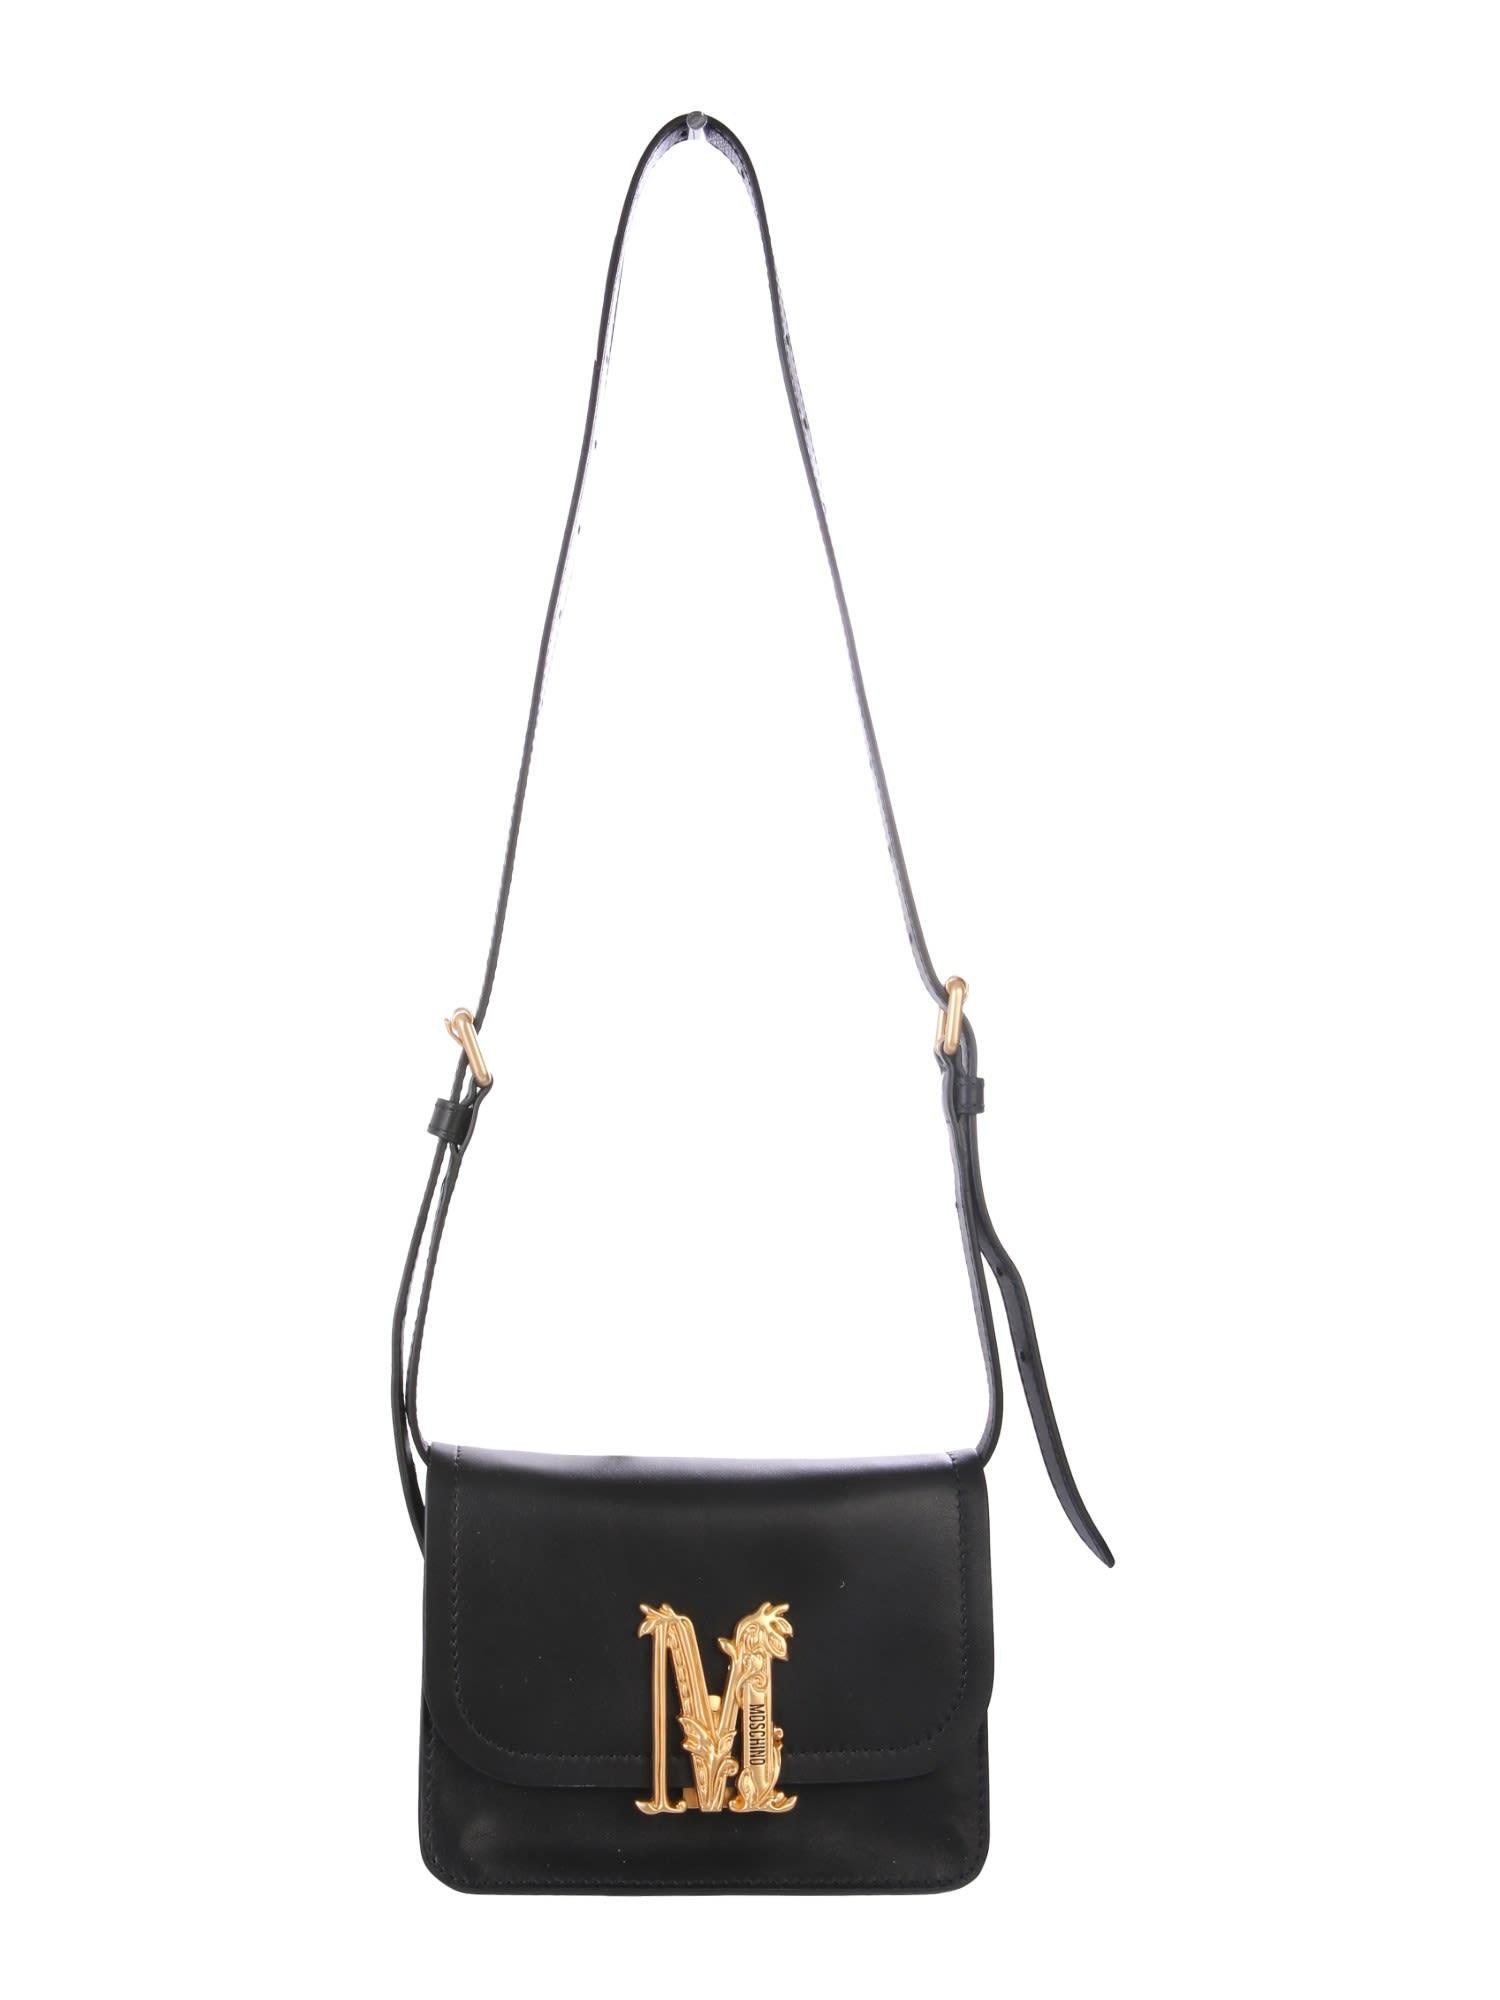 Moschino BAG WITH LOGO